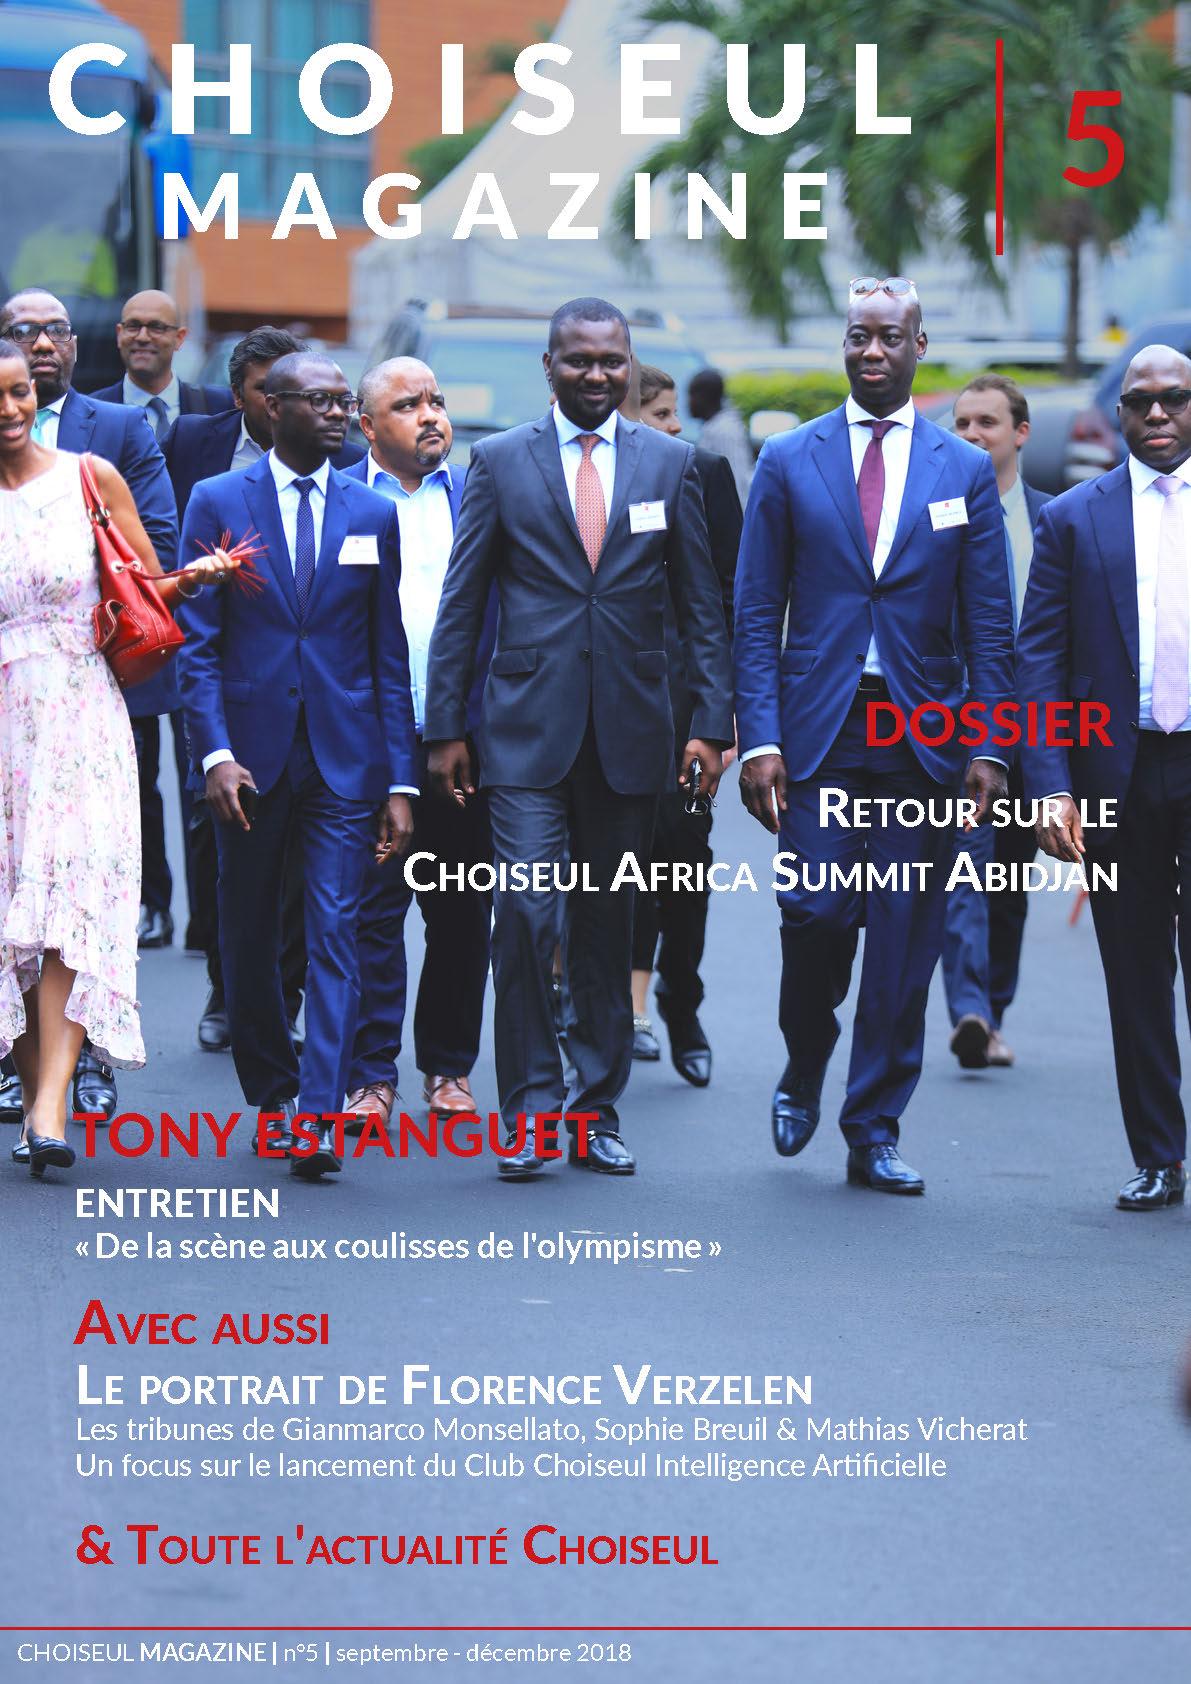 Choiseul Magazine n°5